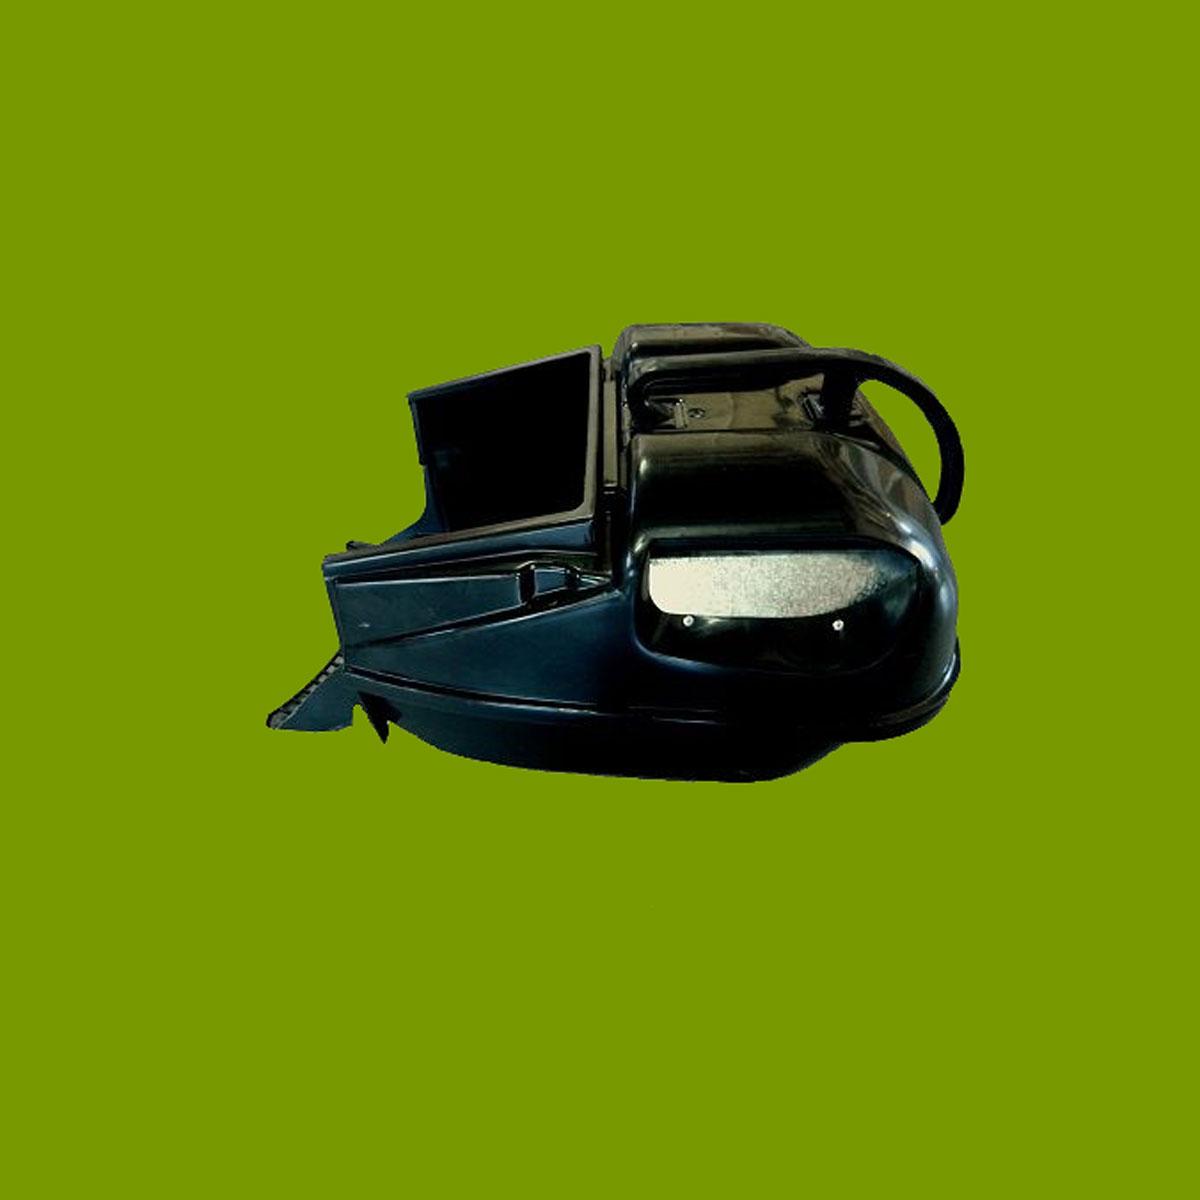 Genuine Rover Catcher Bag Only B650140121 [B650140121